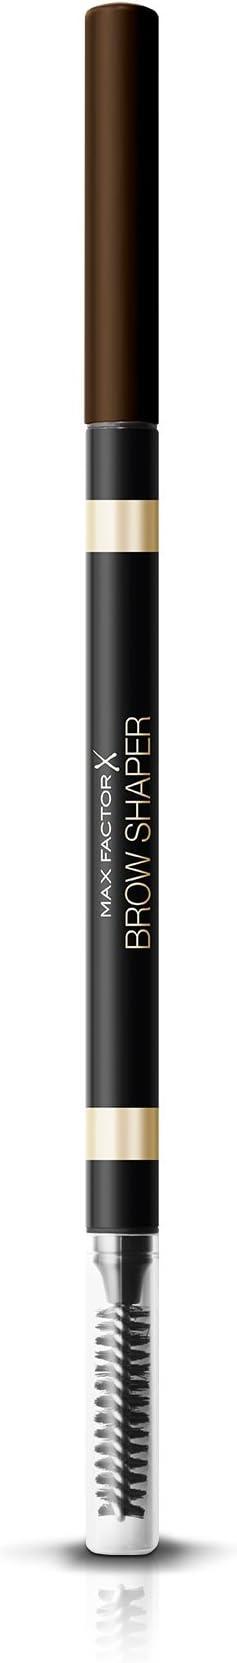 Max Factor Brow Shaper Pencil 30 Deep Brown, 1g